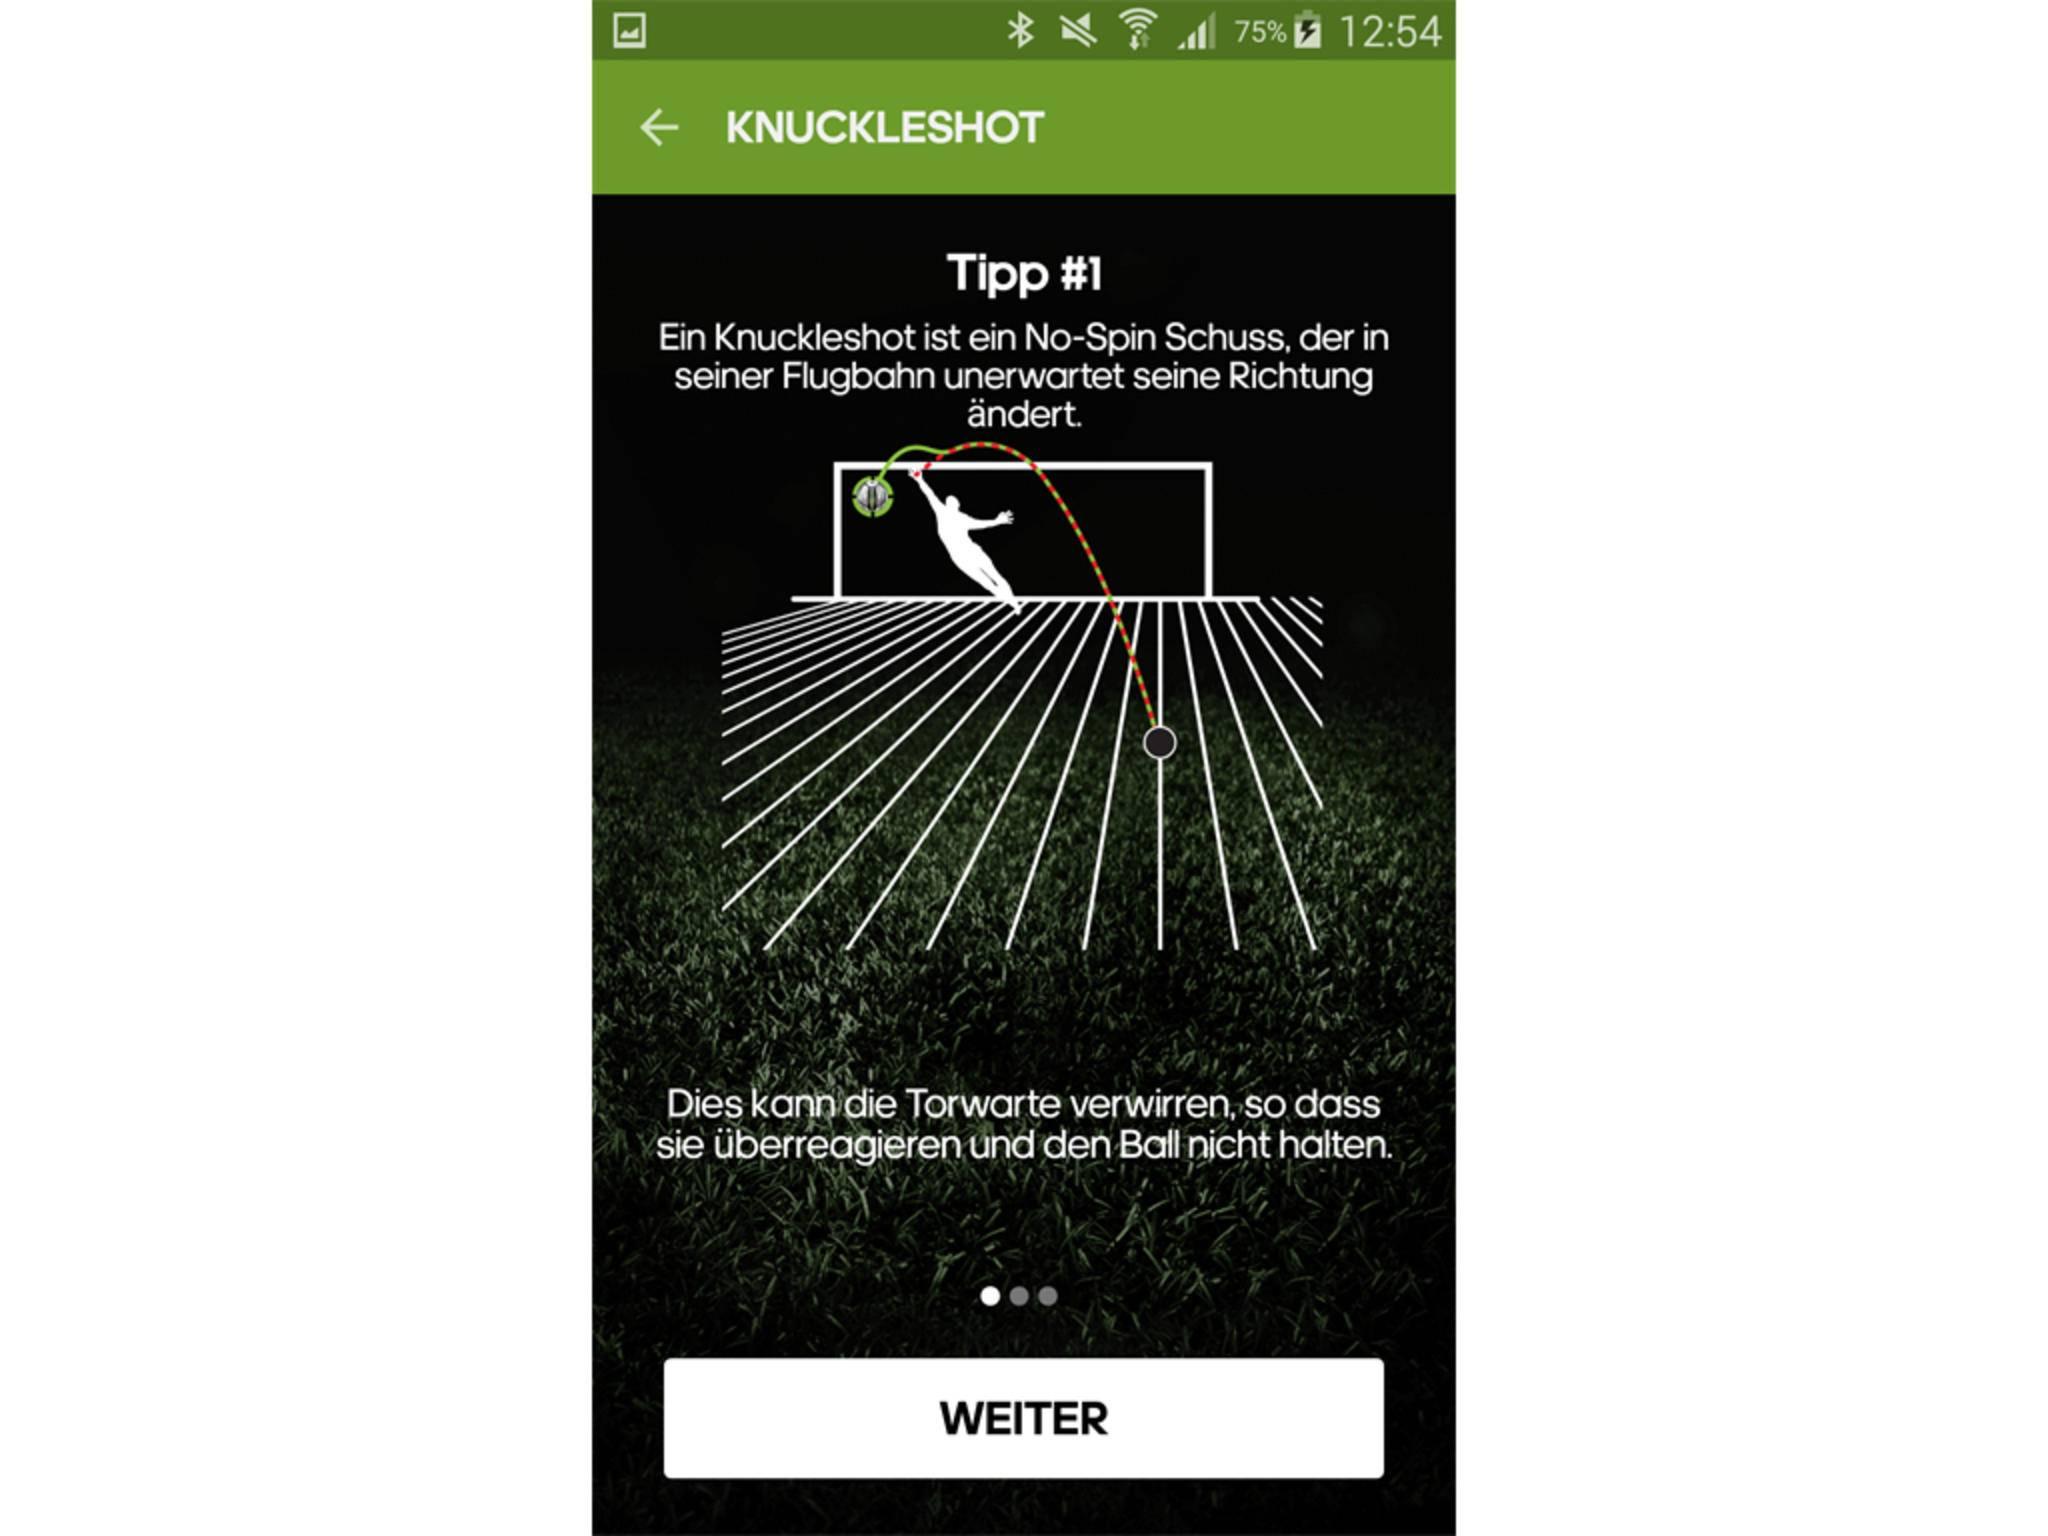 Adidas miCoach Smart Ball App 13